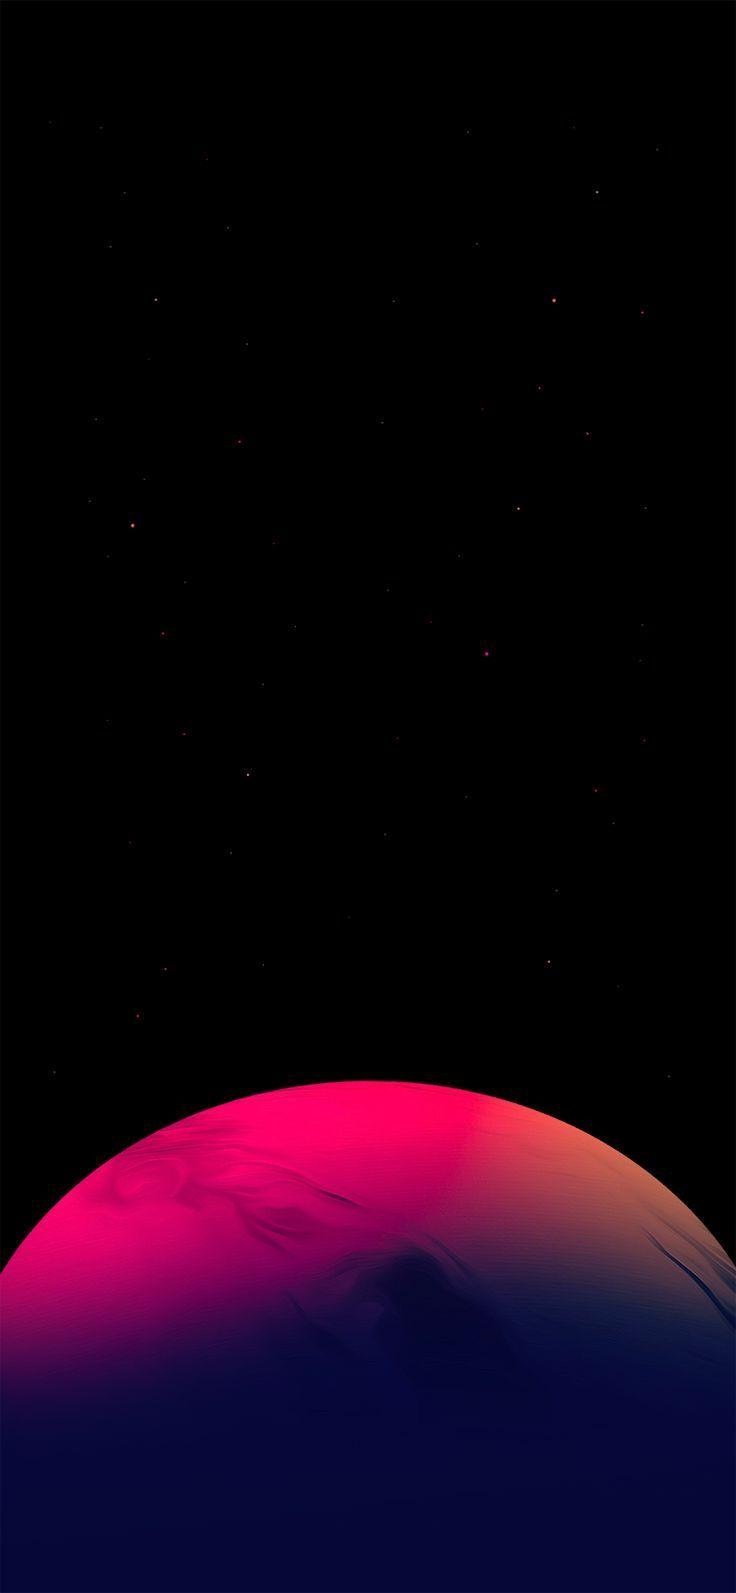 Space von AR72014 (iPhone X / XS / XR / XSMAX)